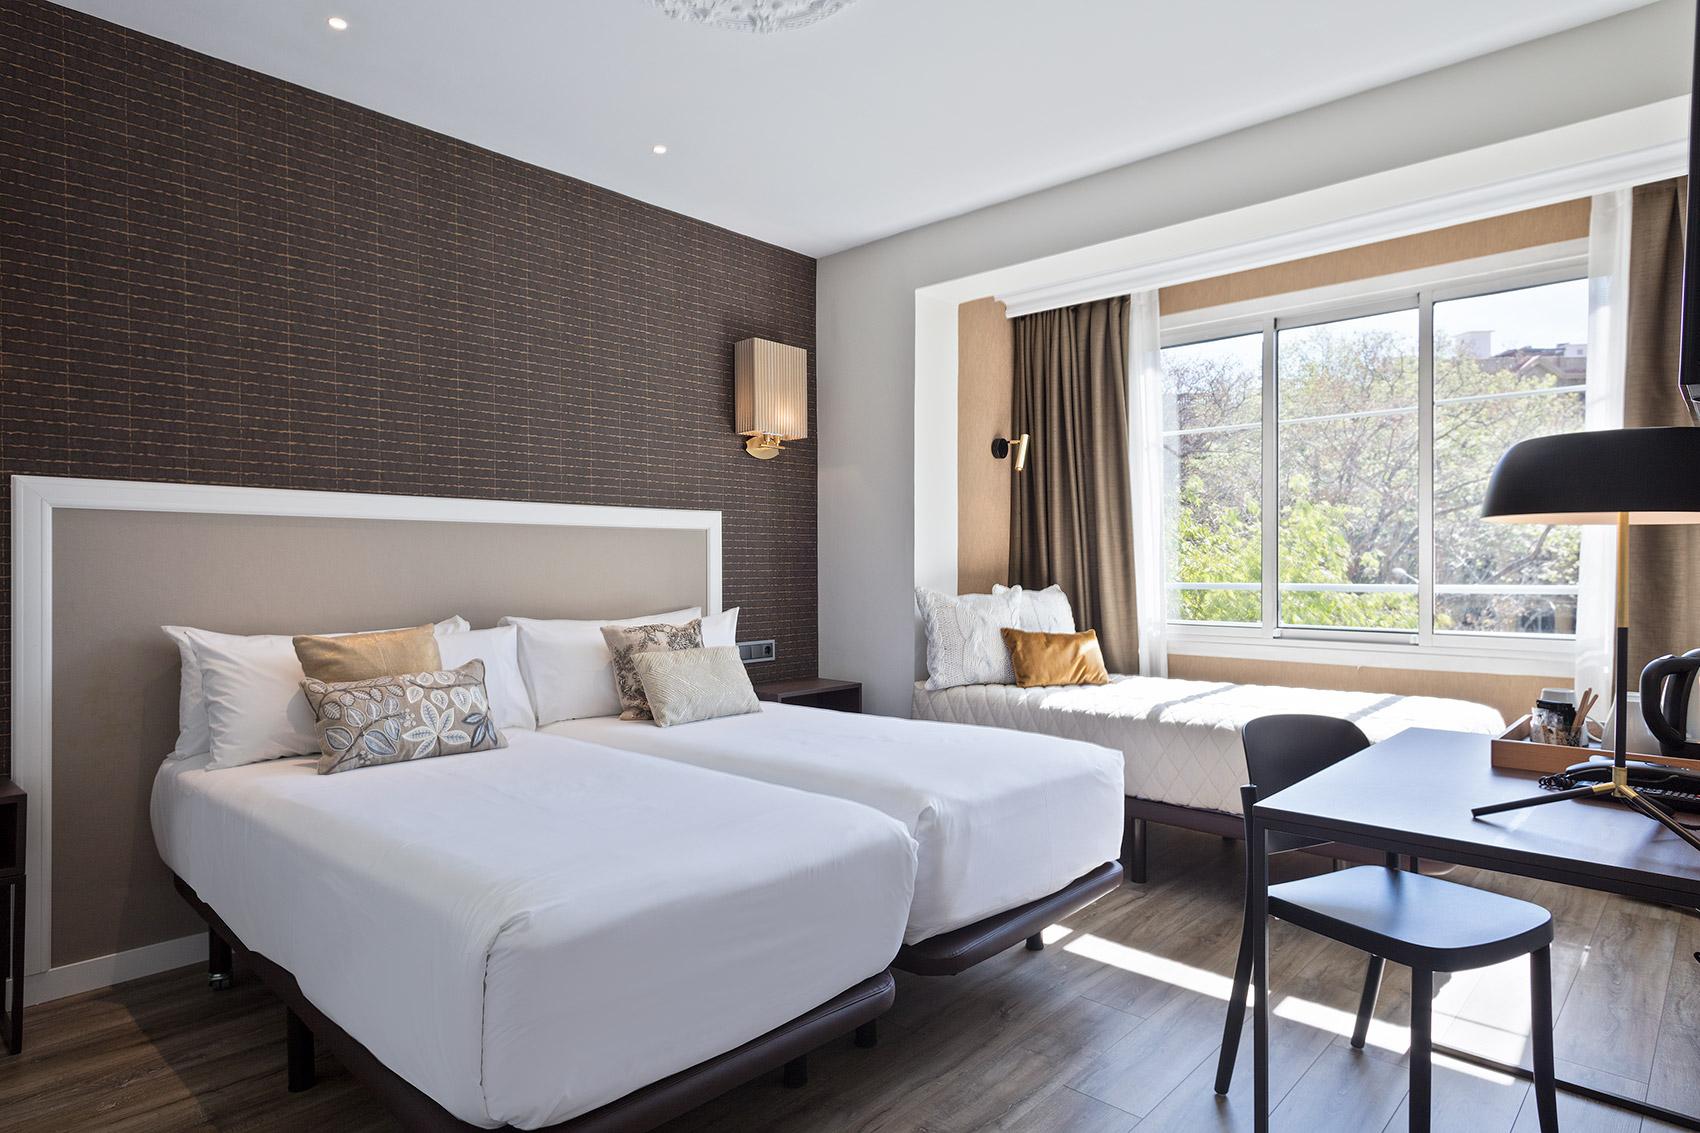 HOTEL_ACTA_SPLENDID_TRIPLE_02